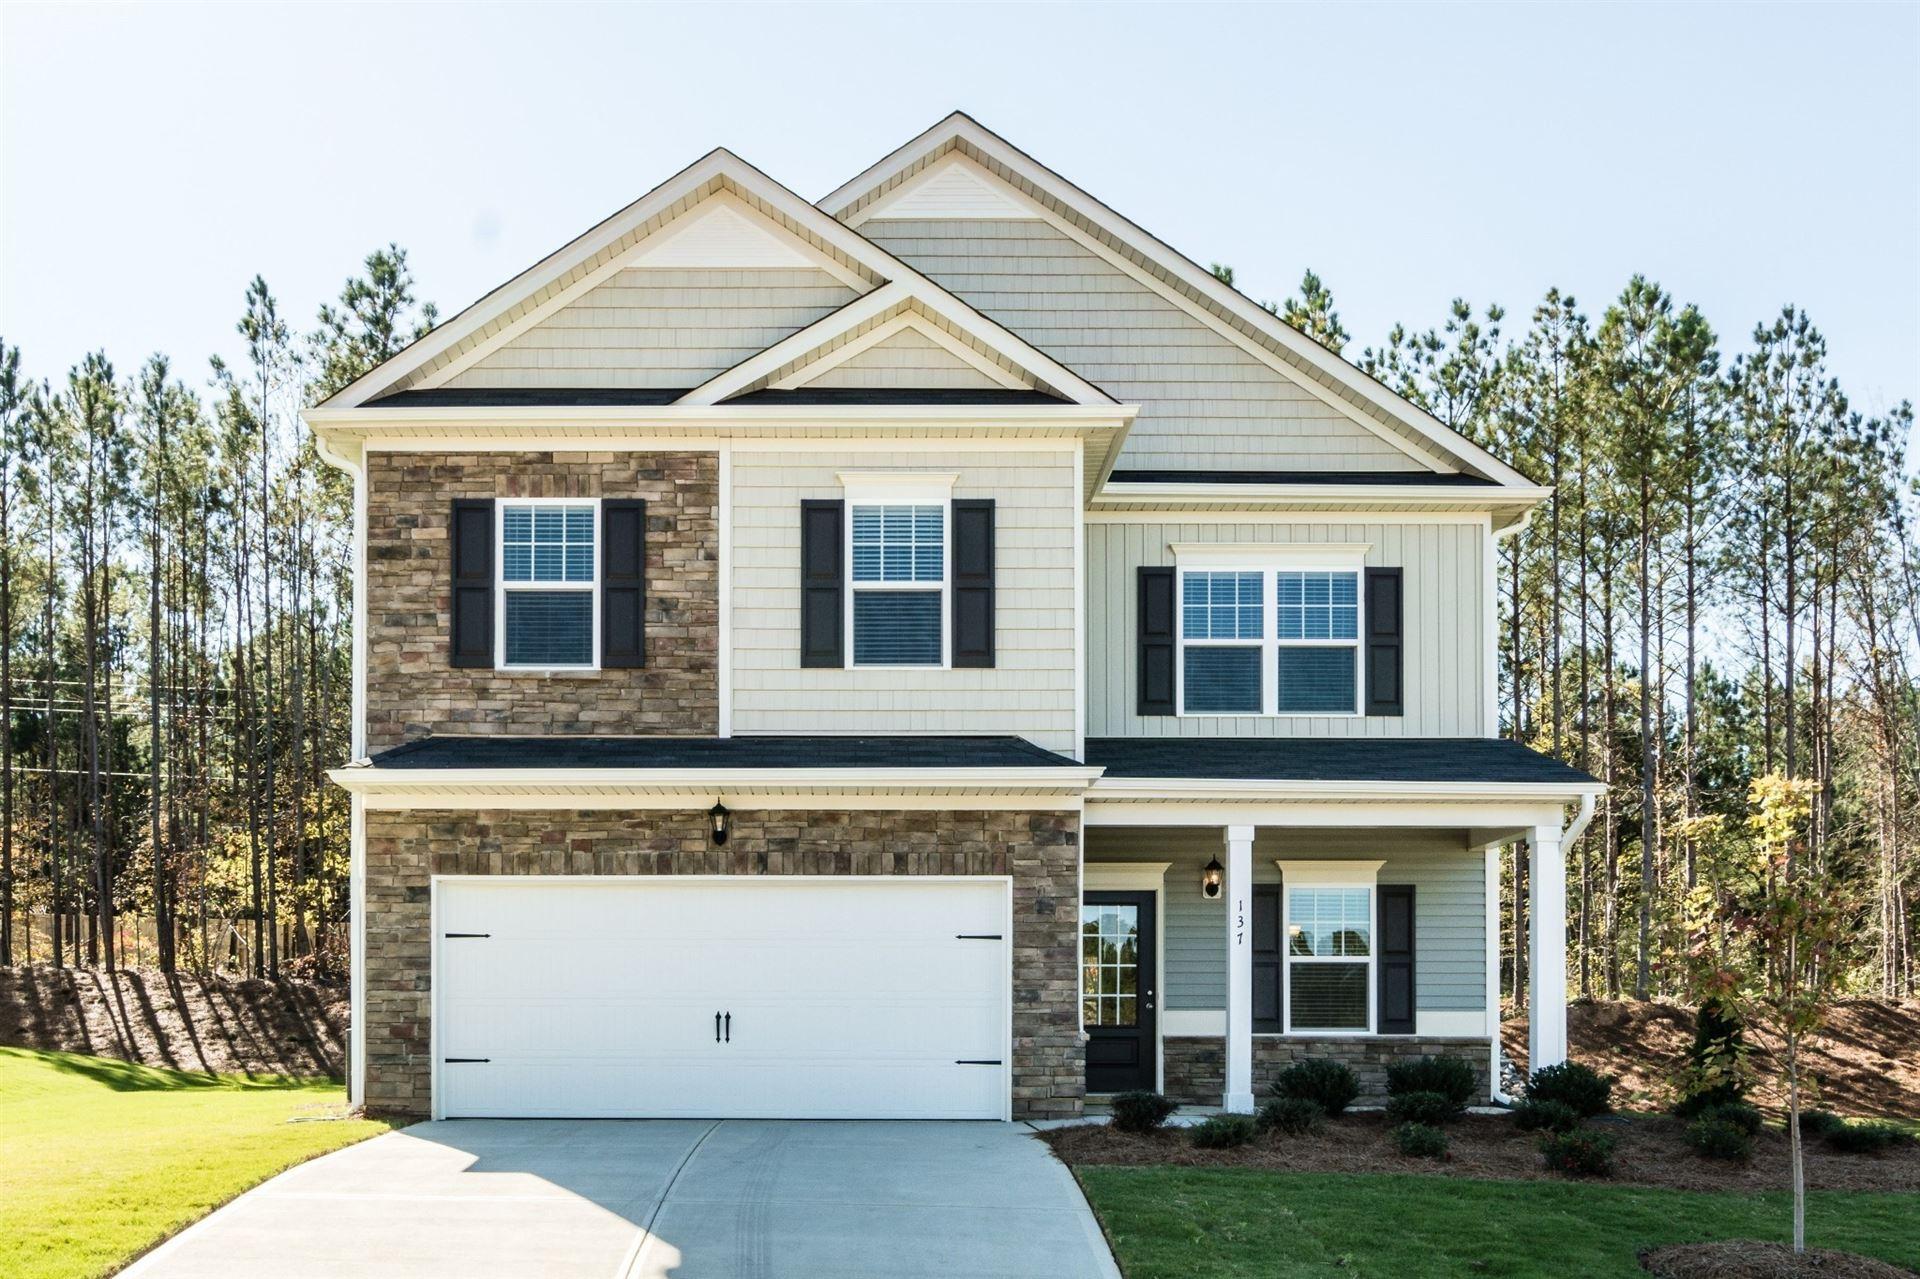 3718 Pelham Wood Dr, Murfreesboro, TN 37128 - MLS#: 2173415